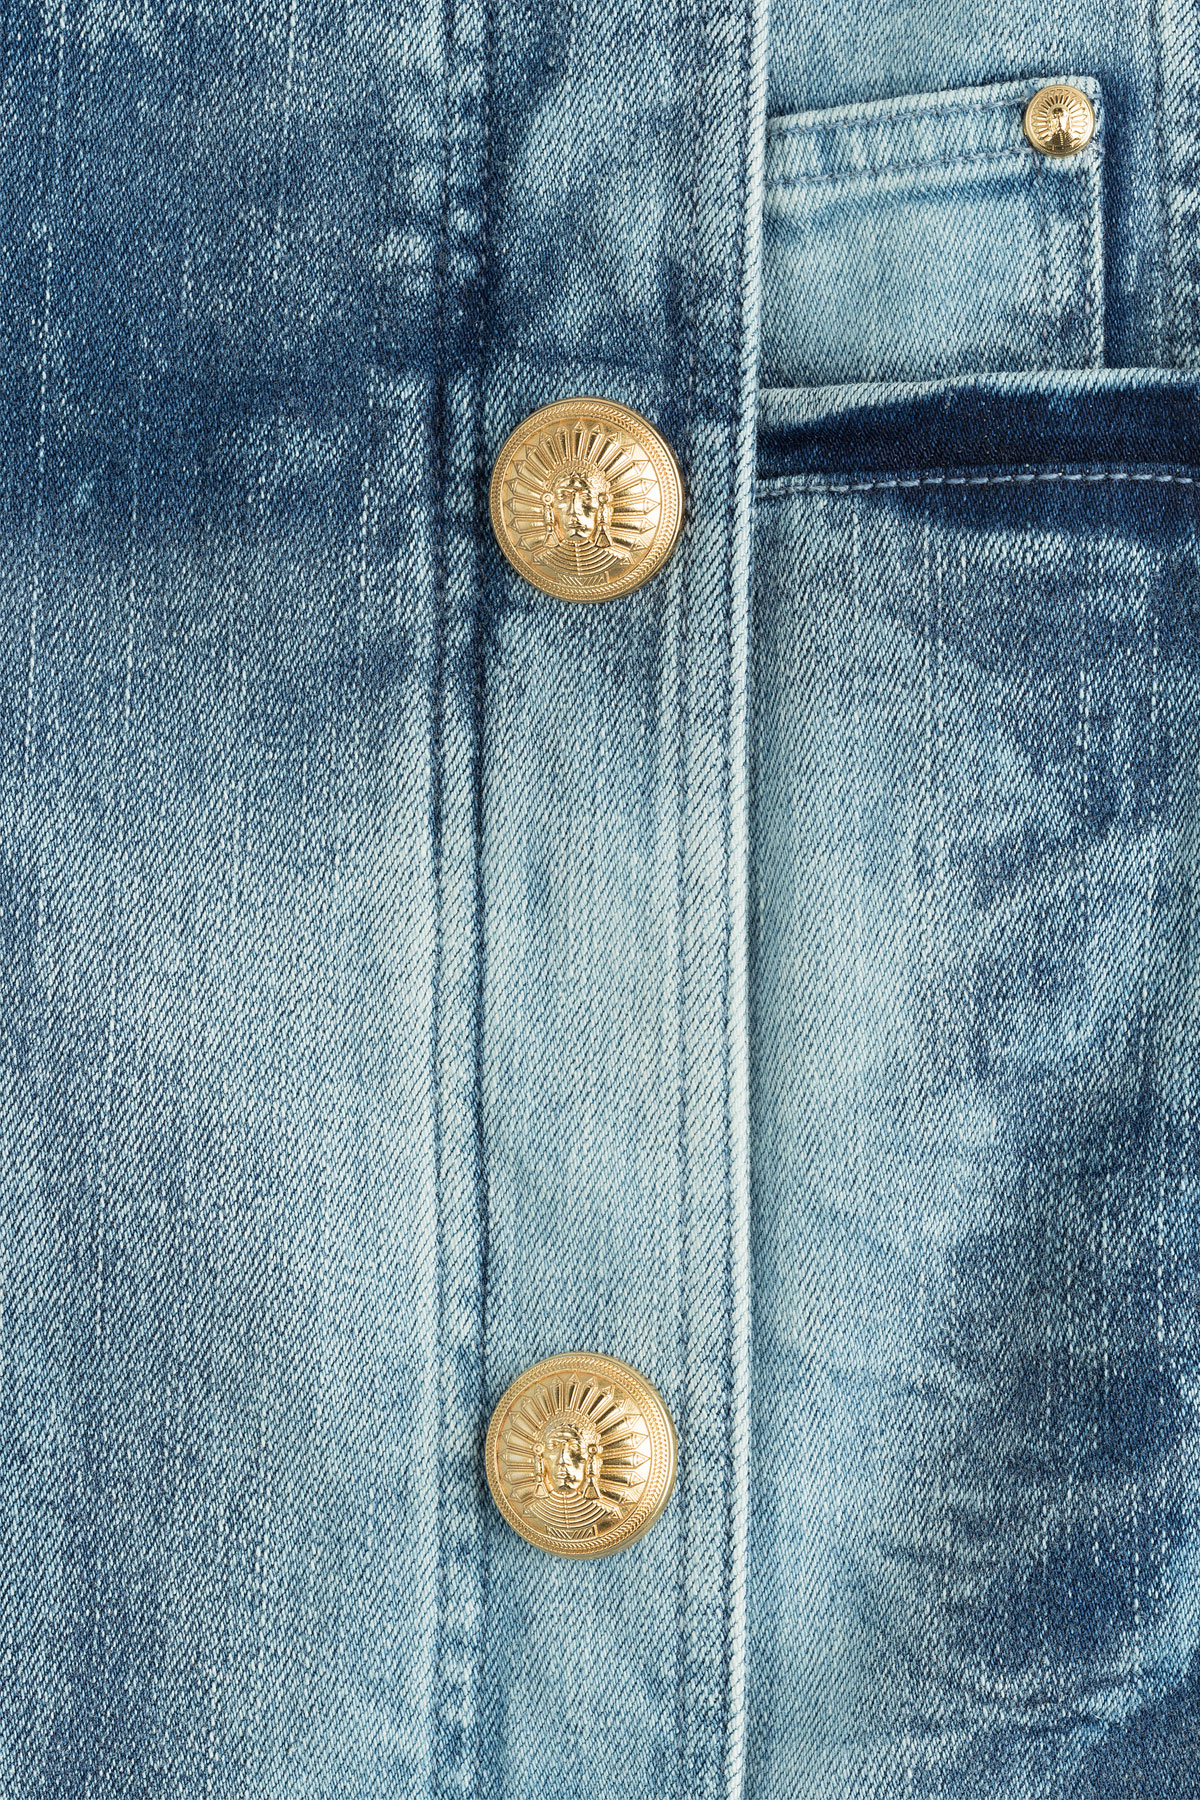 Balmain Denim Skirt With Gold Tone Buttons In Blue Lyst